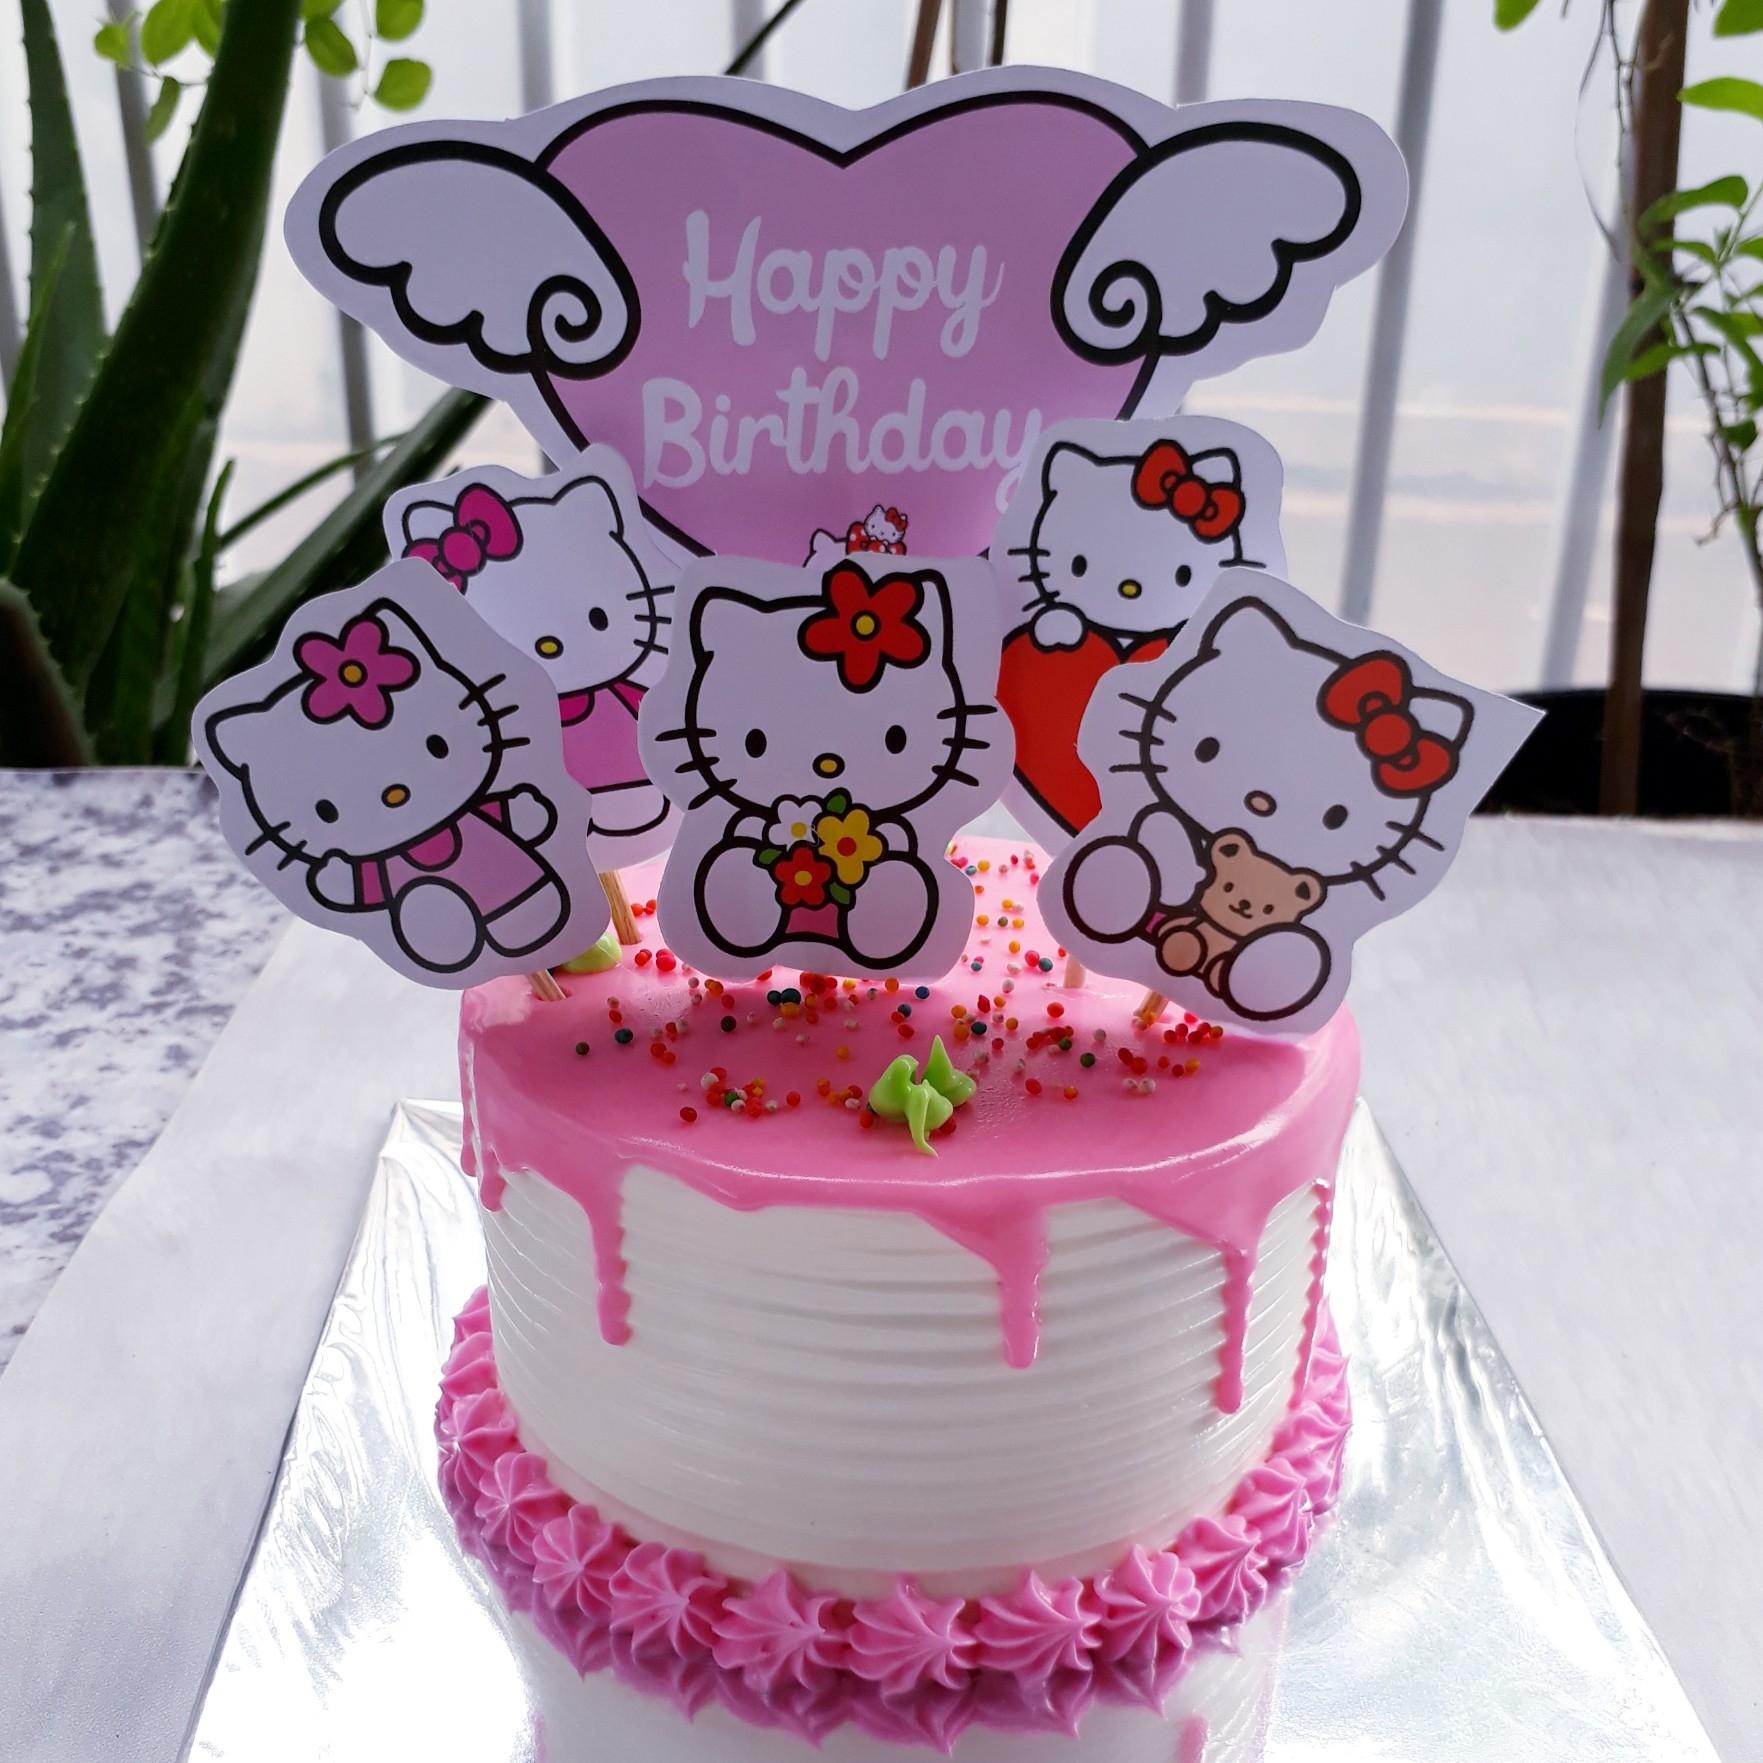 Brownies Cinta Cake Rawalumbu Makanan Delivery Menu Grabfood Id